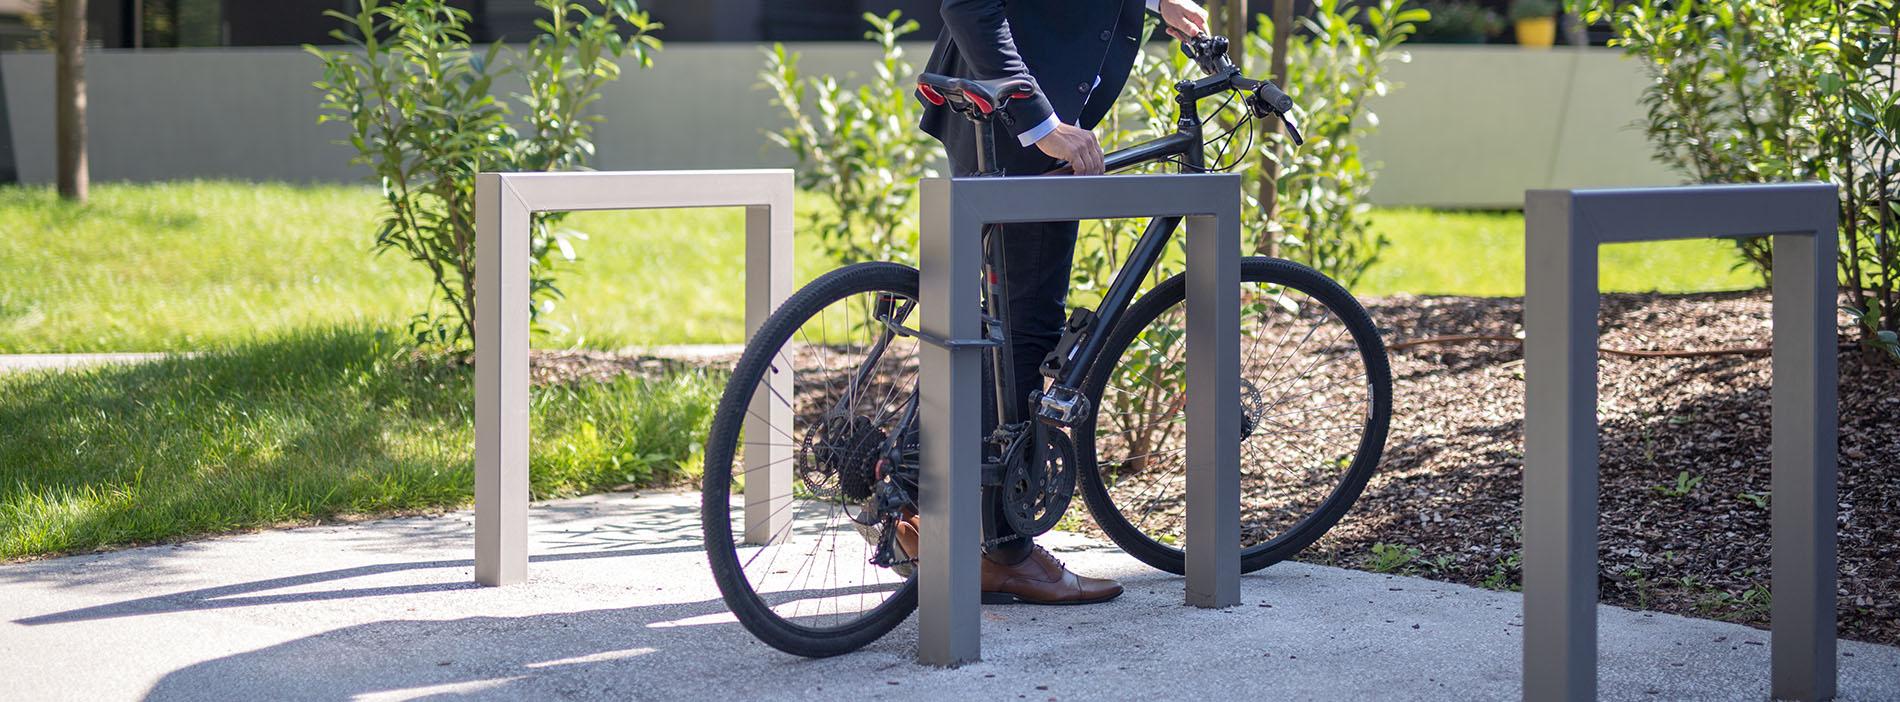 cinesi aparcament bicicletes